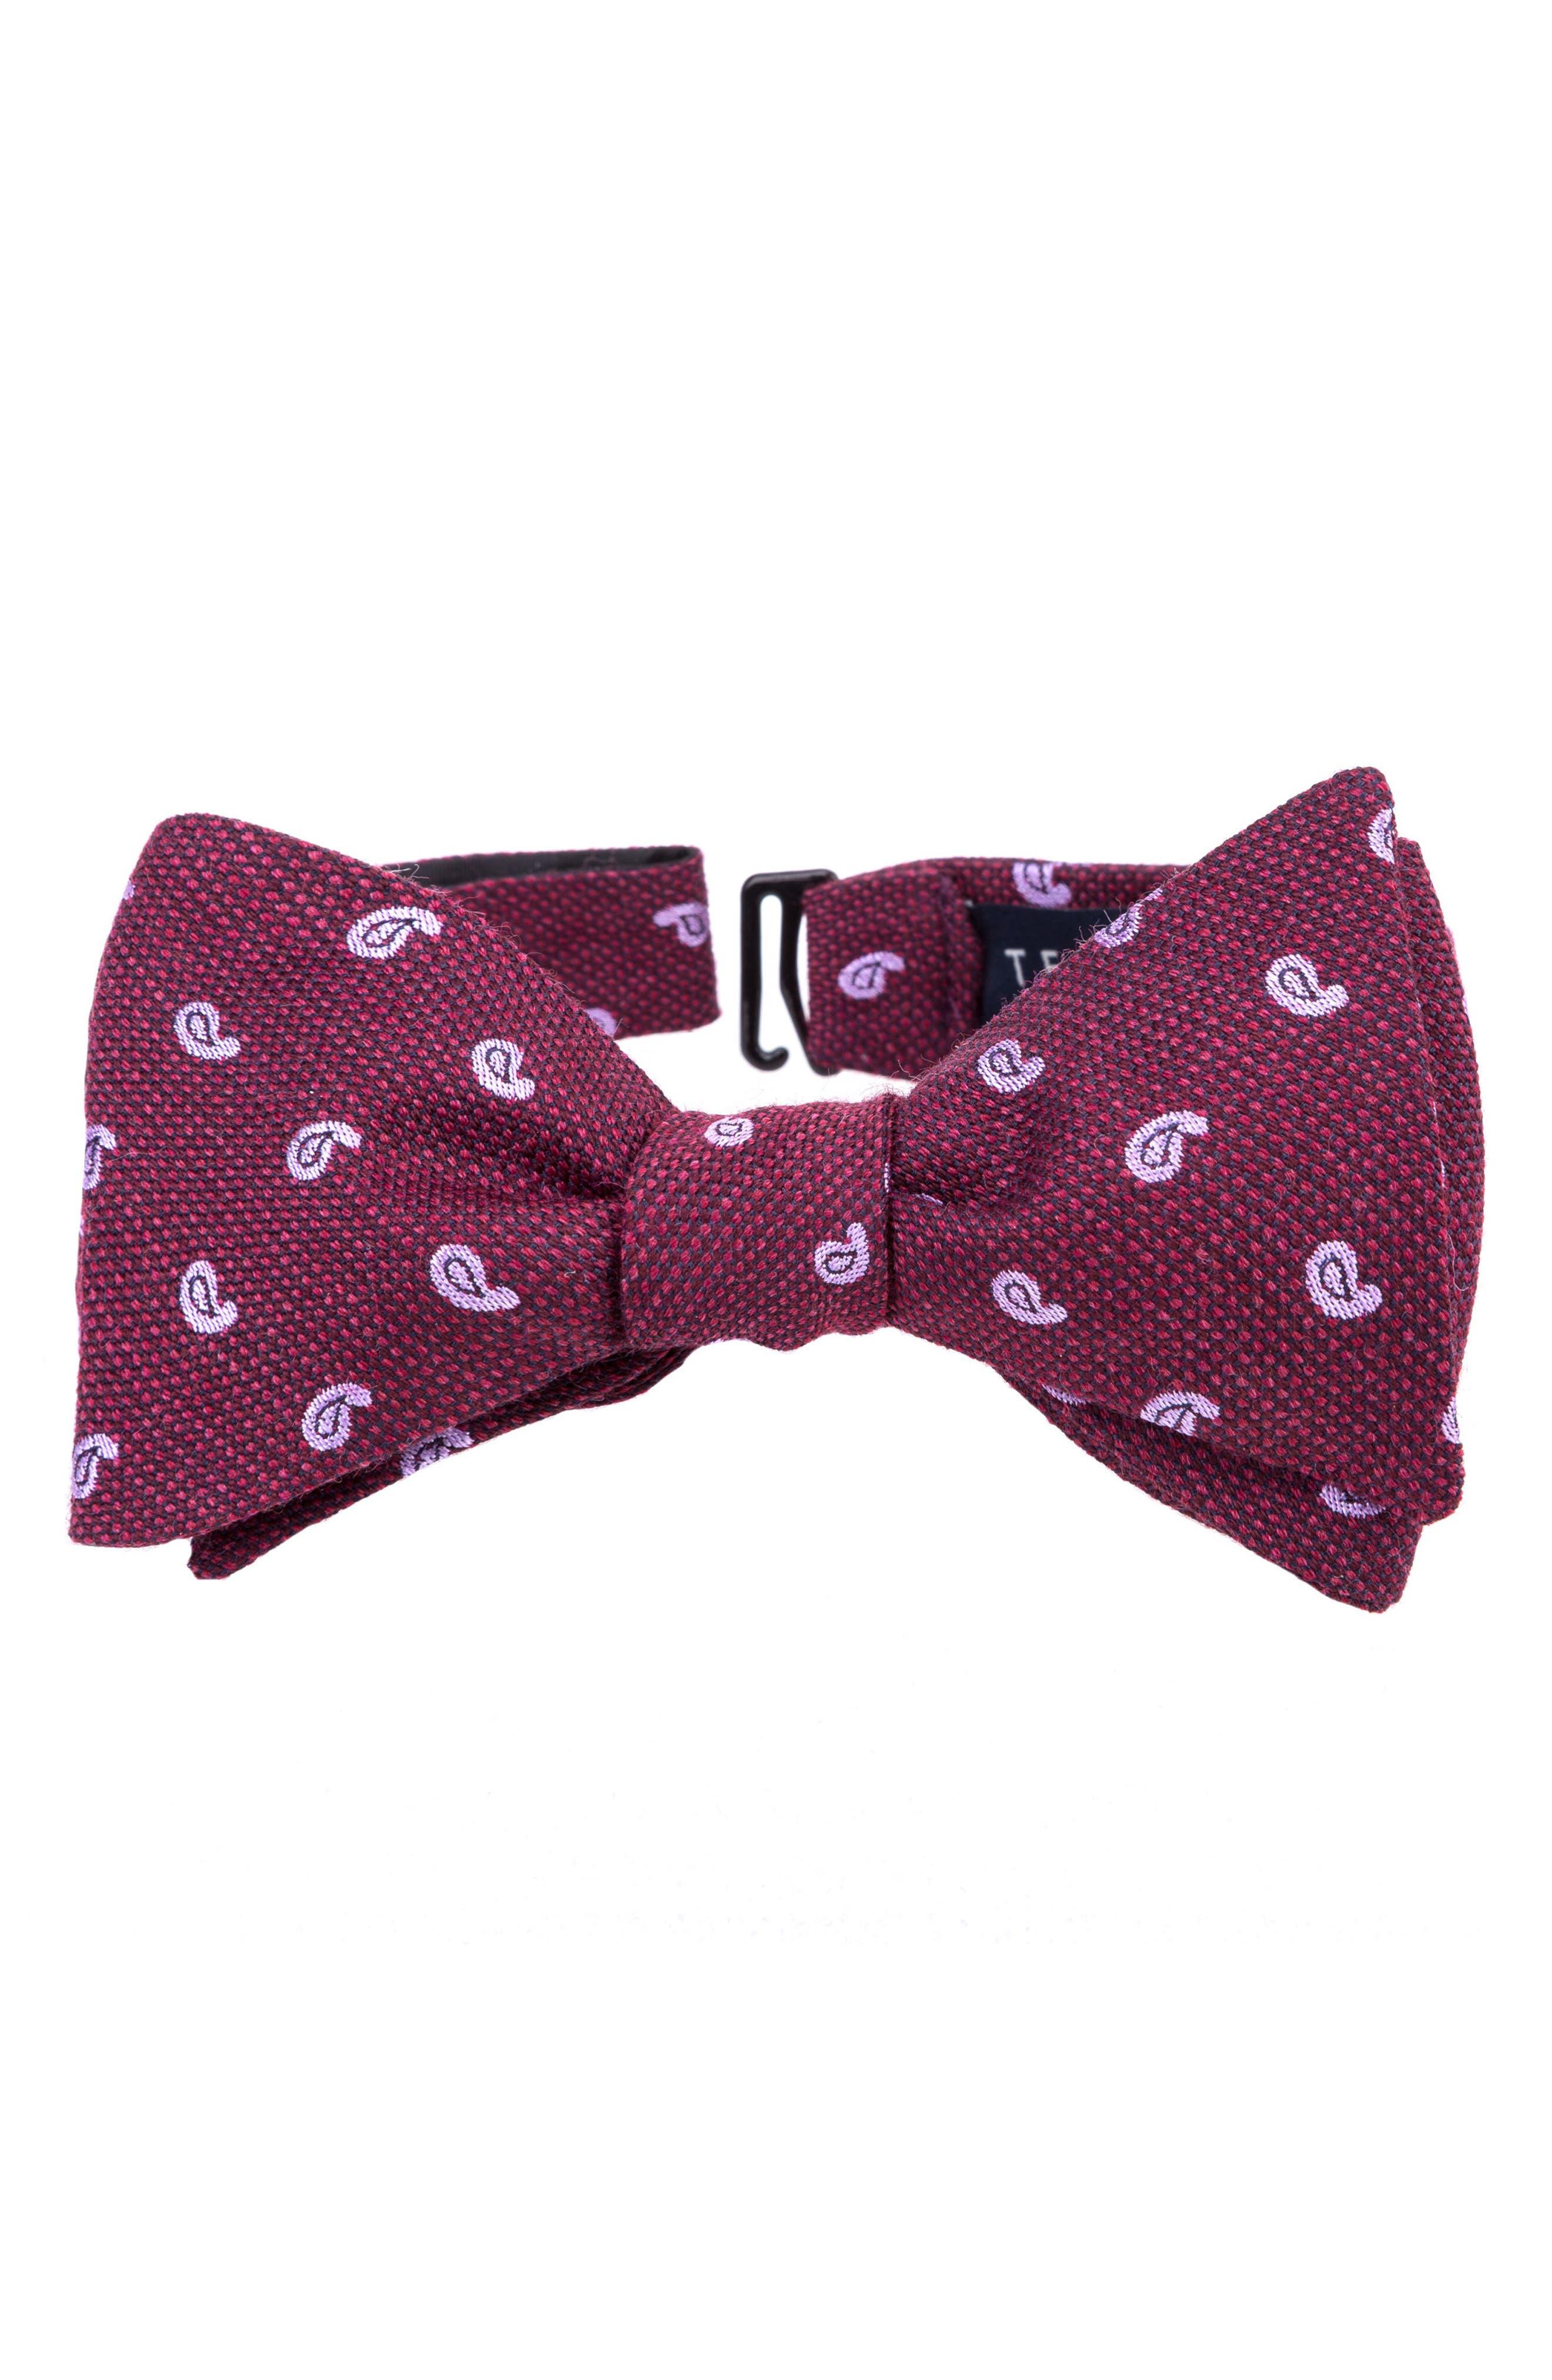 Alternate Image 1 Selected - Ted Baker London Paisley Silk & Wool Bow Tie